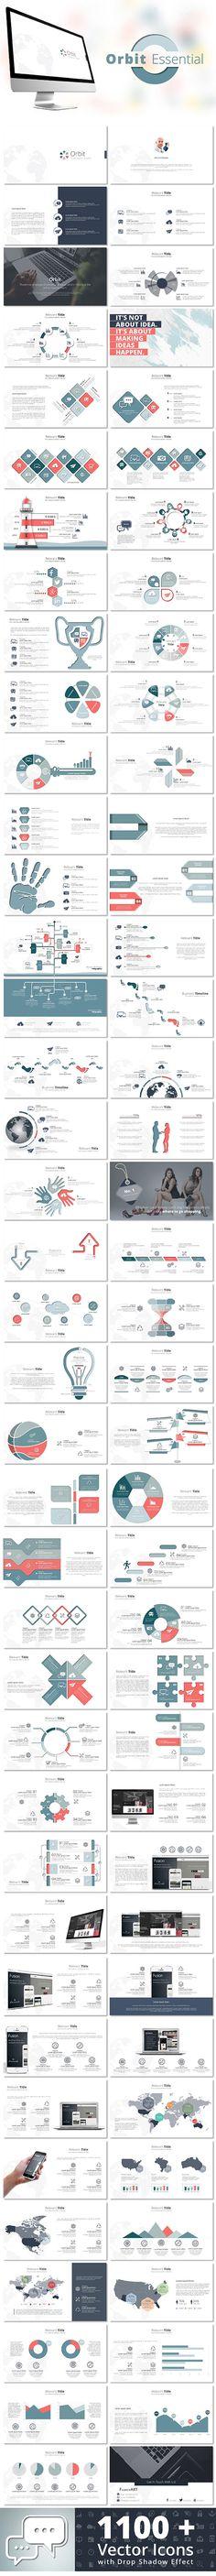 Orbit Essential Keynote Template #design #slides Download: http://graphicriver.net/item/orbit-essential-keynote-template/13233581?ref=ksioks